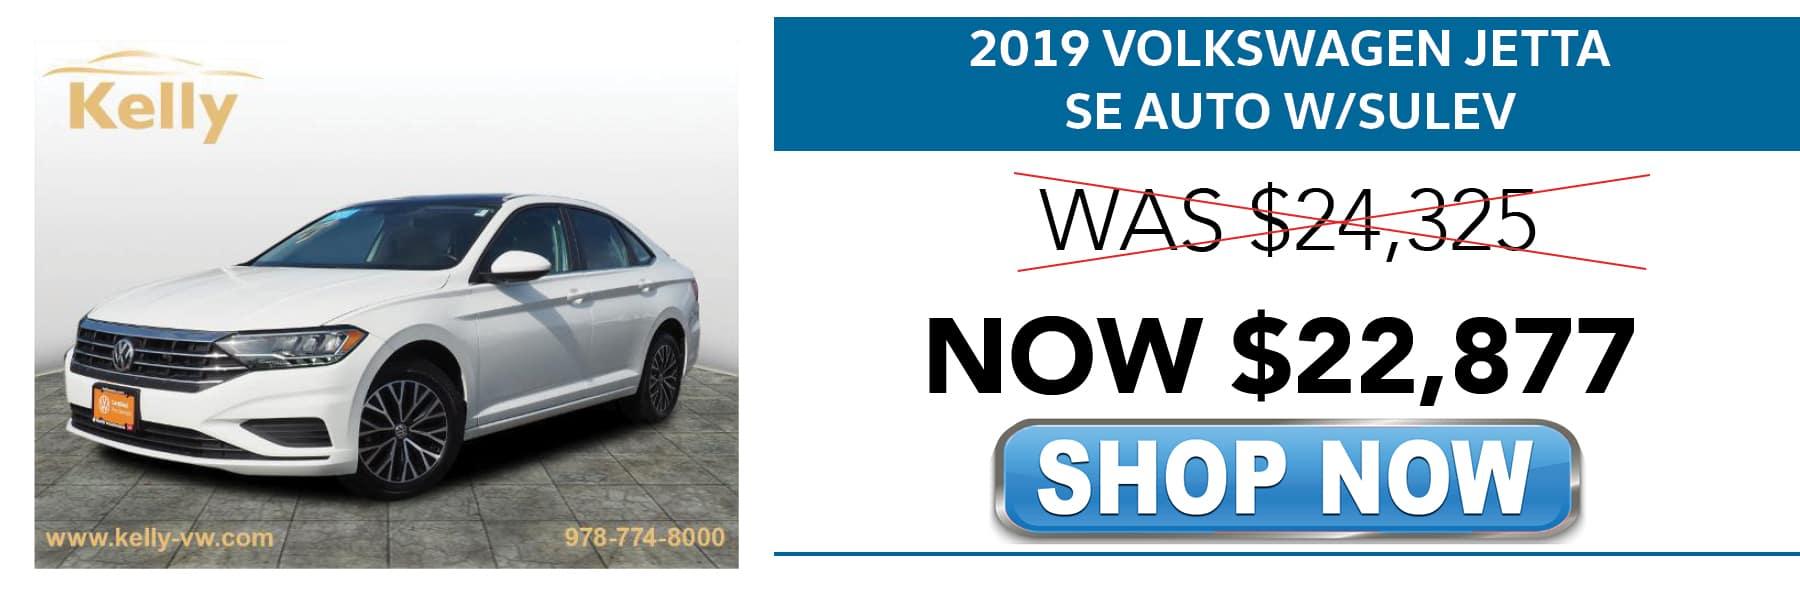 Certified Pre-Owned 2019 Volkswagen Jetta SE Now $22,877